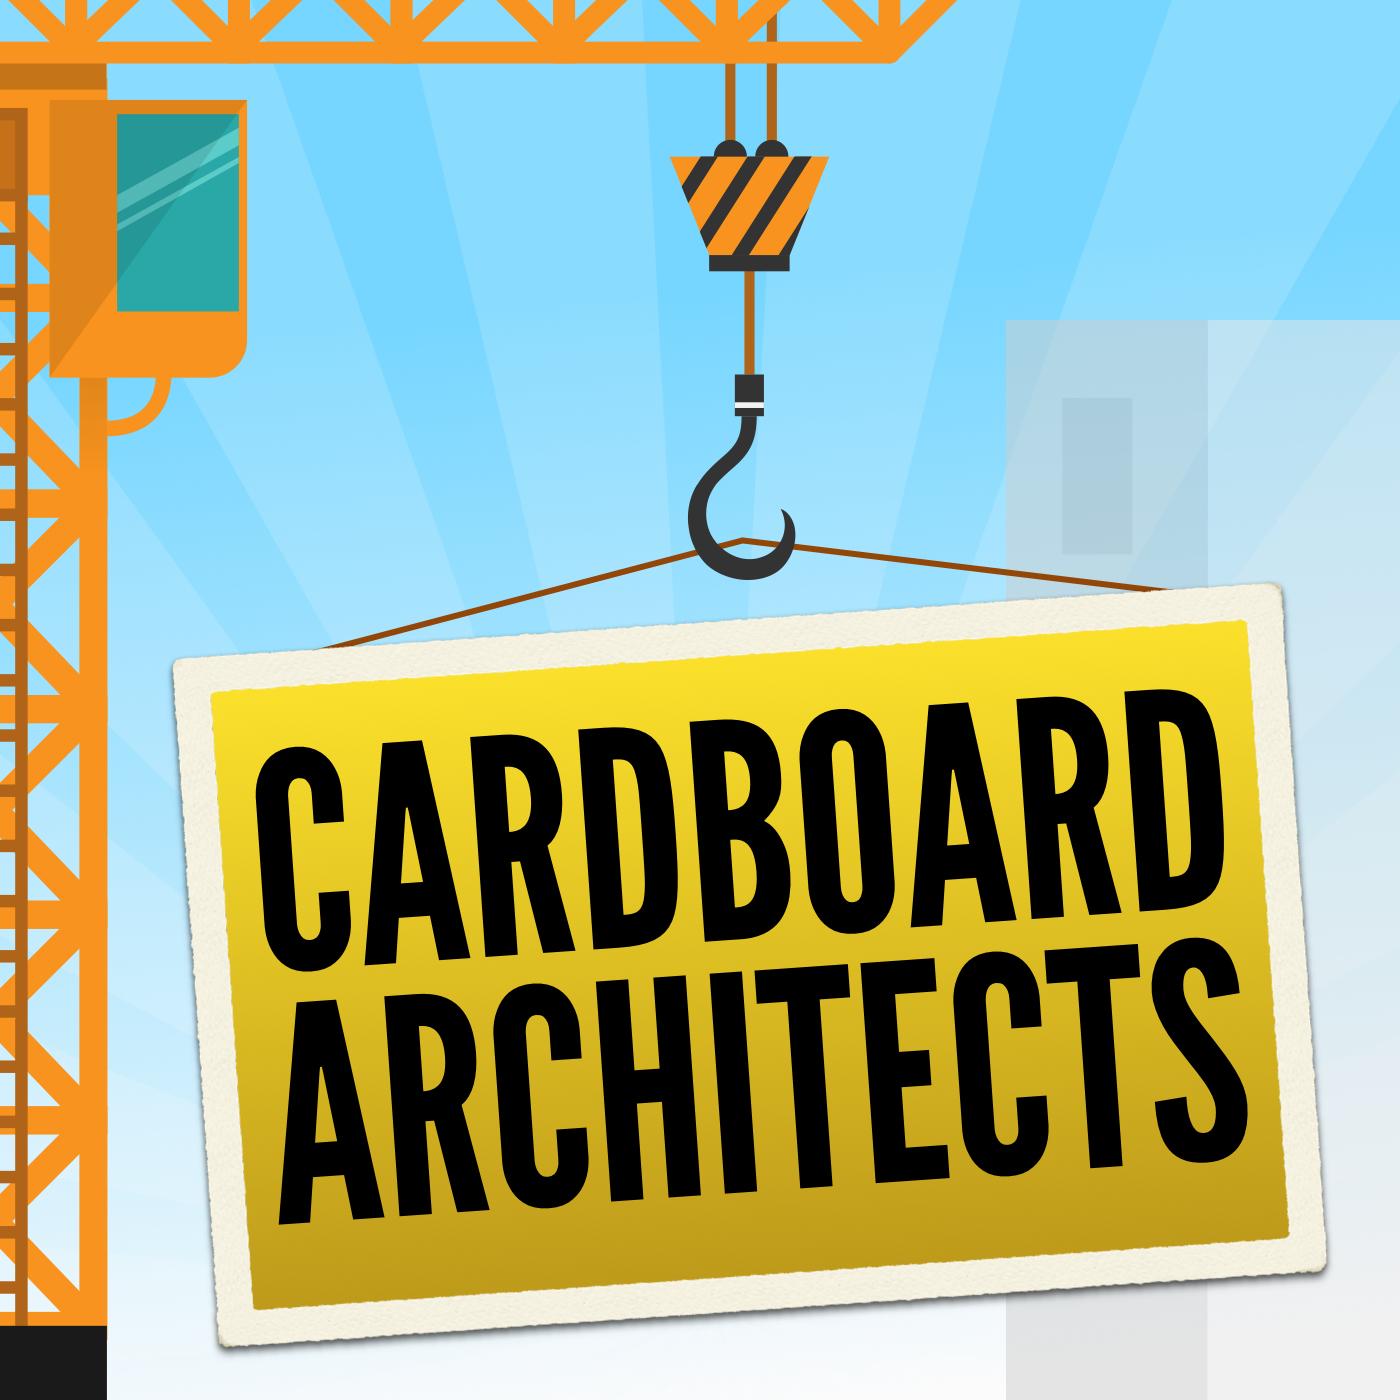 Cardboard Architects Logo (square).jpg